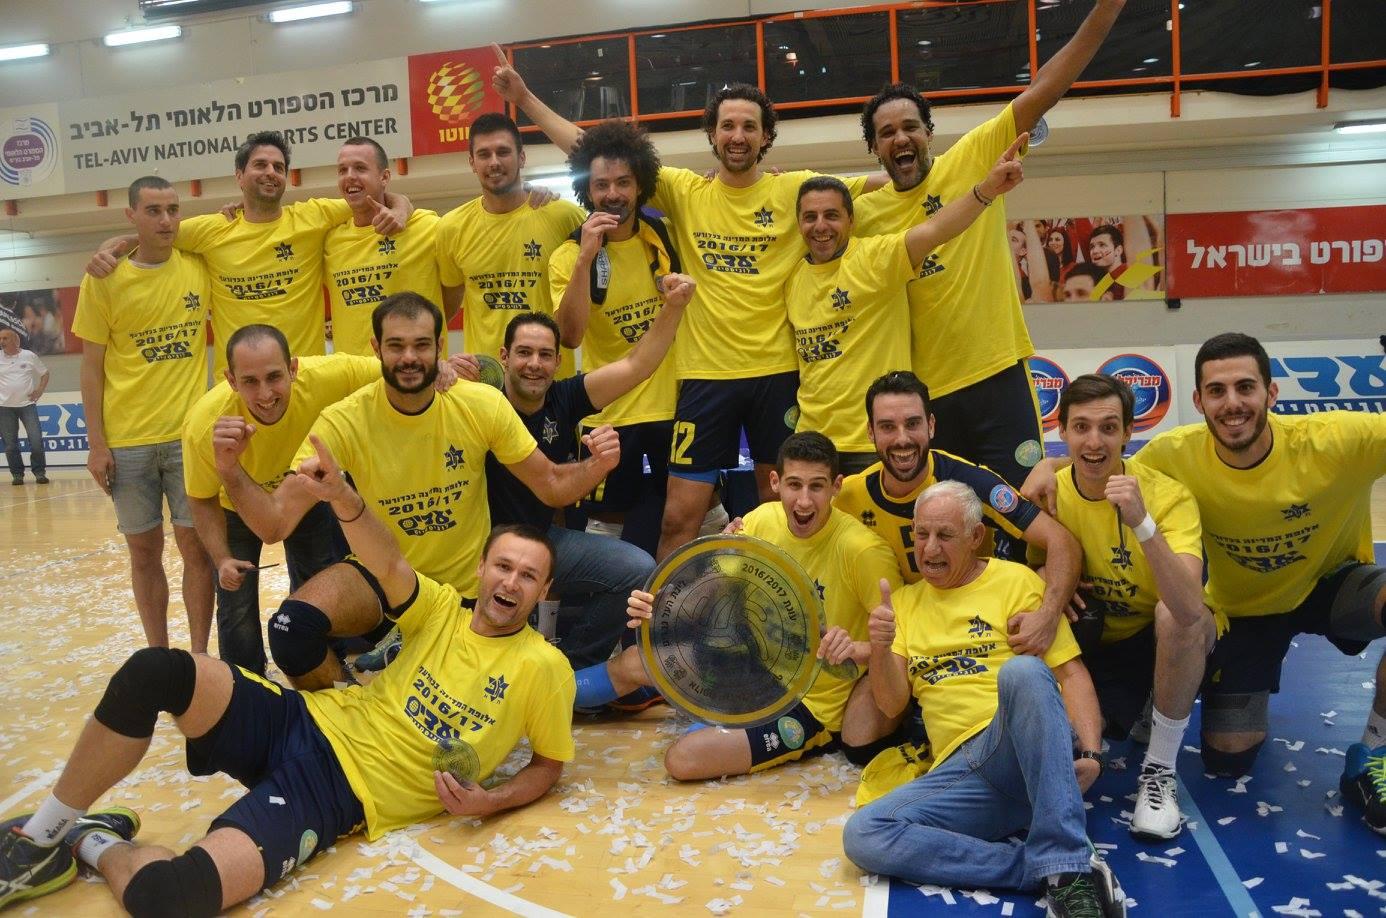 Maccabées nom équipe sportive israélienne Maccabi Tel-Aviv équipe basket Euroligue